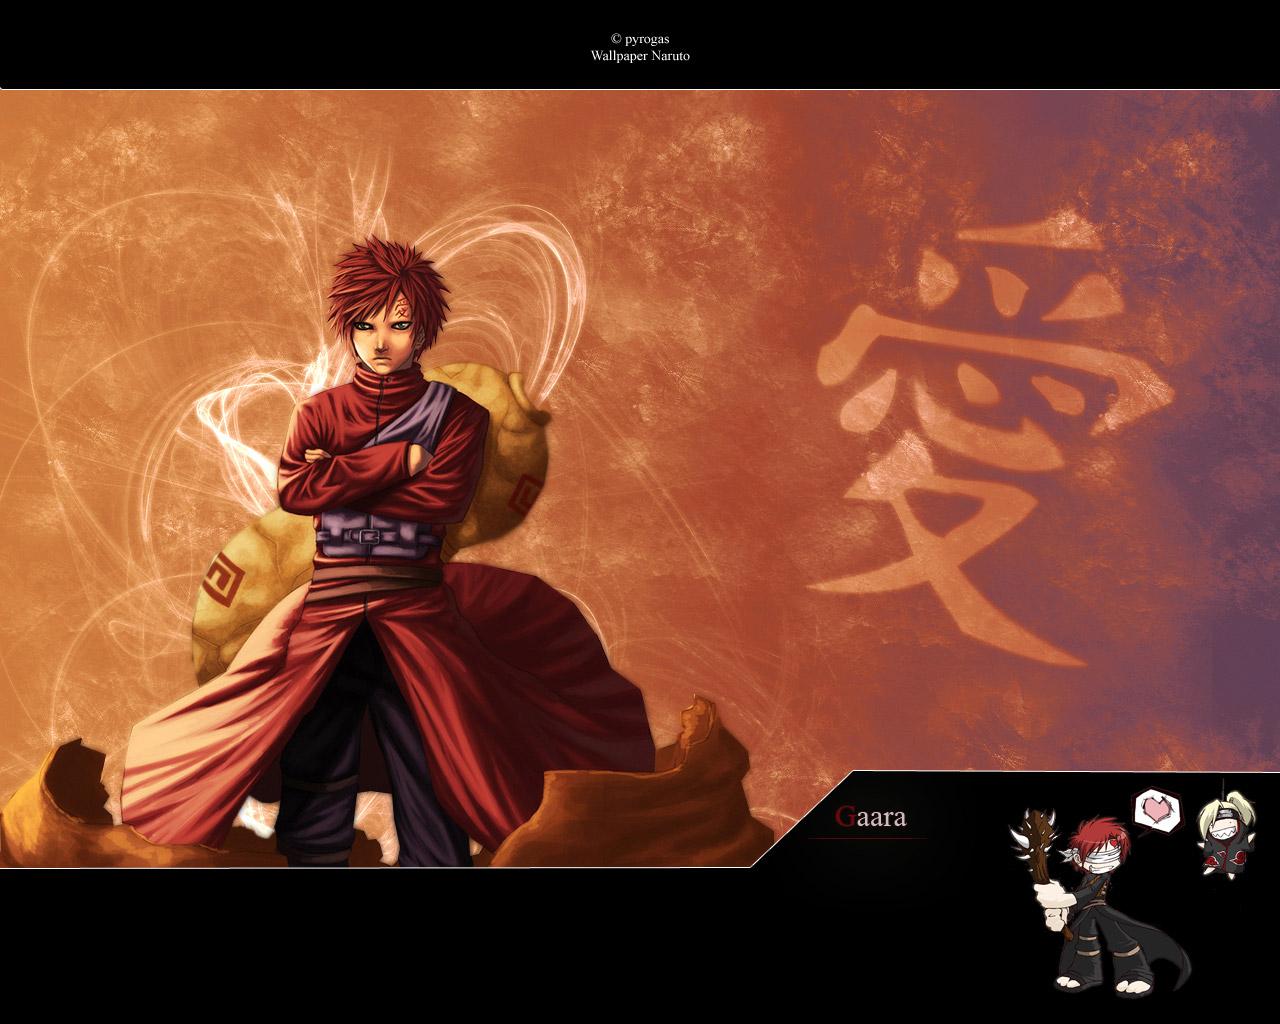 Best Wallpaper Naruto Love - gara%252B2  Photograph_428236.jpg